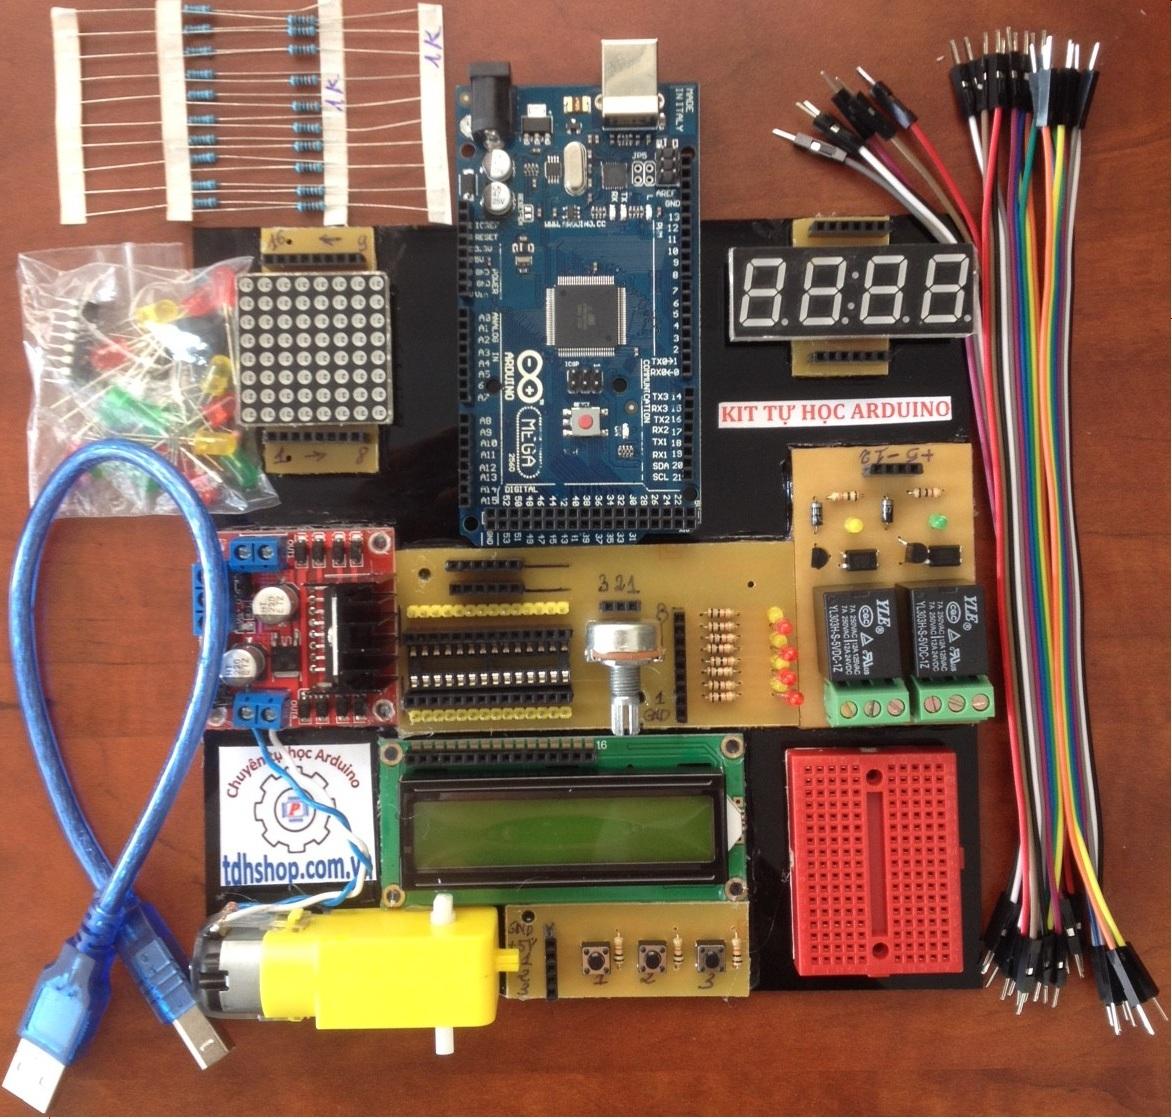 Kit Tự Học Arduino M2